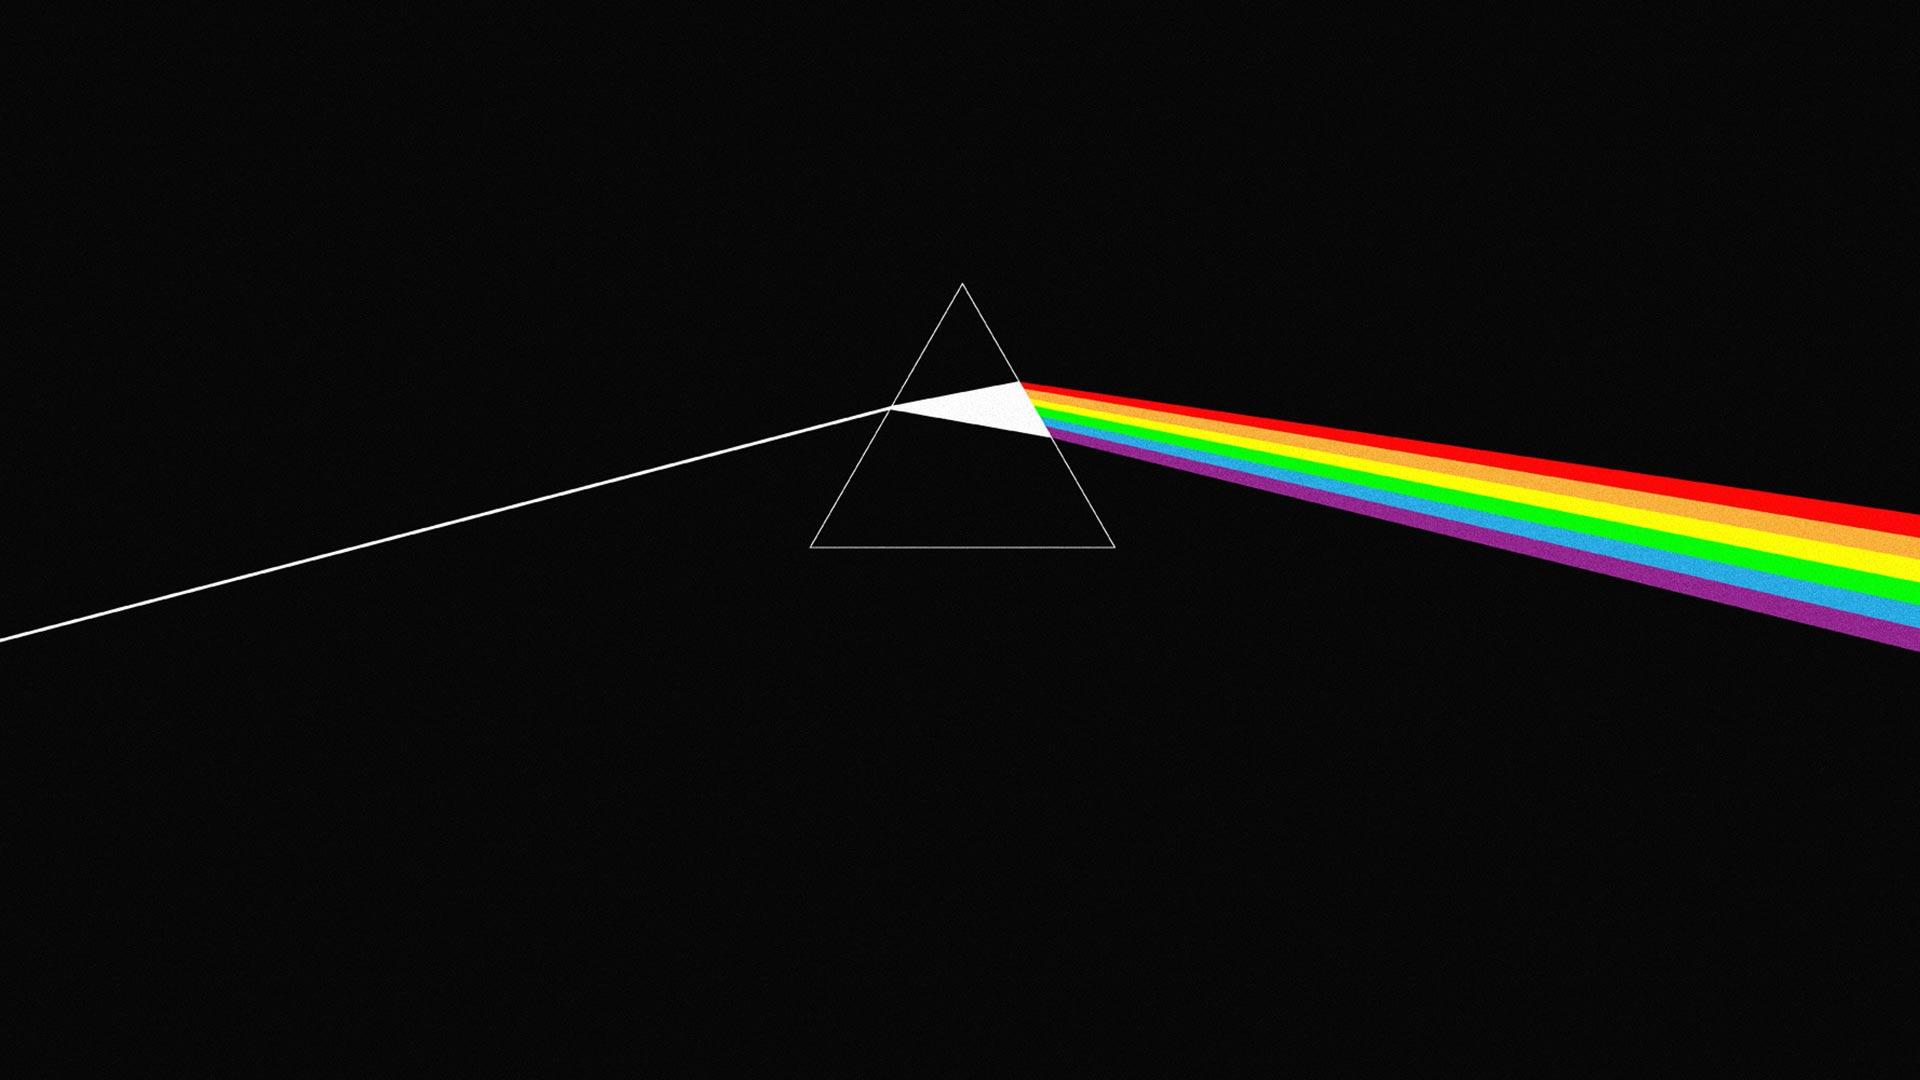 Pink Floyd Dark Side of the Moon HD Wallpaper   Cool Wallpapers 1920x1080